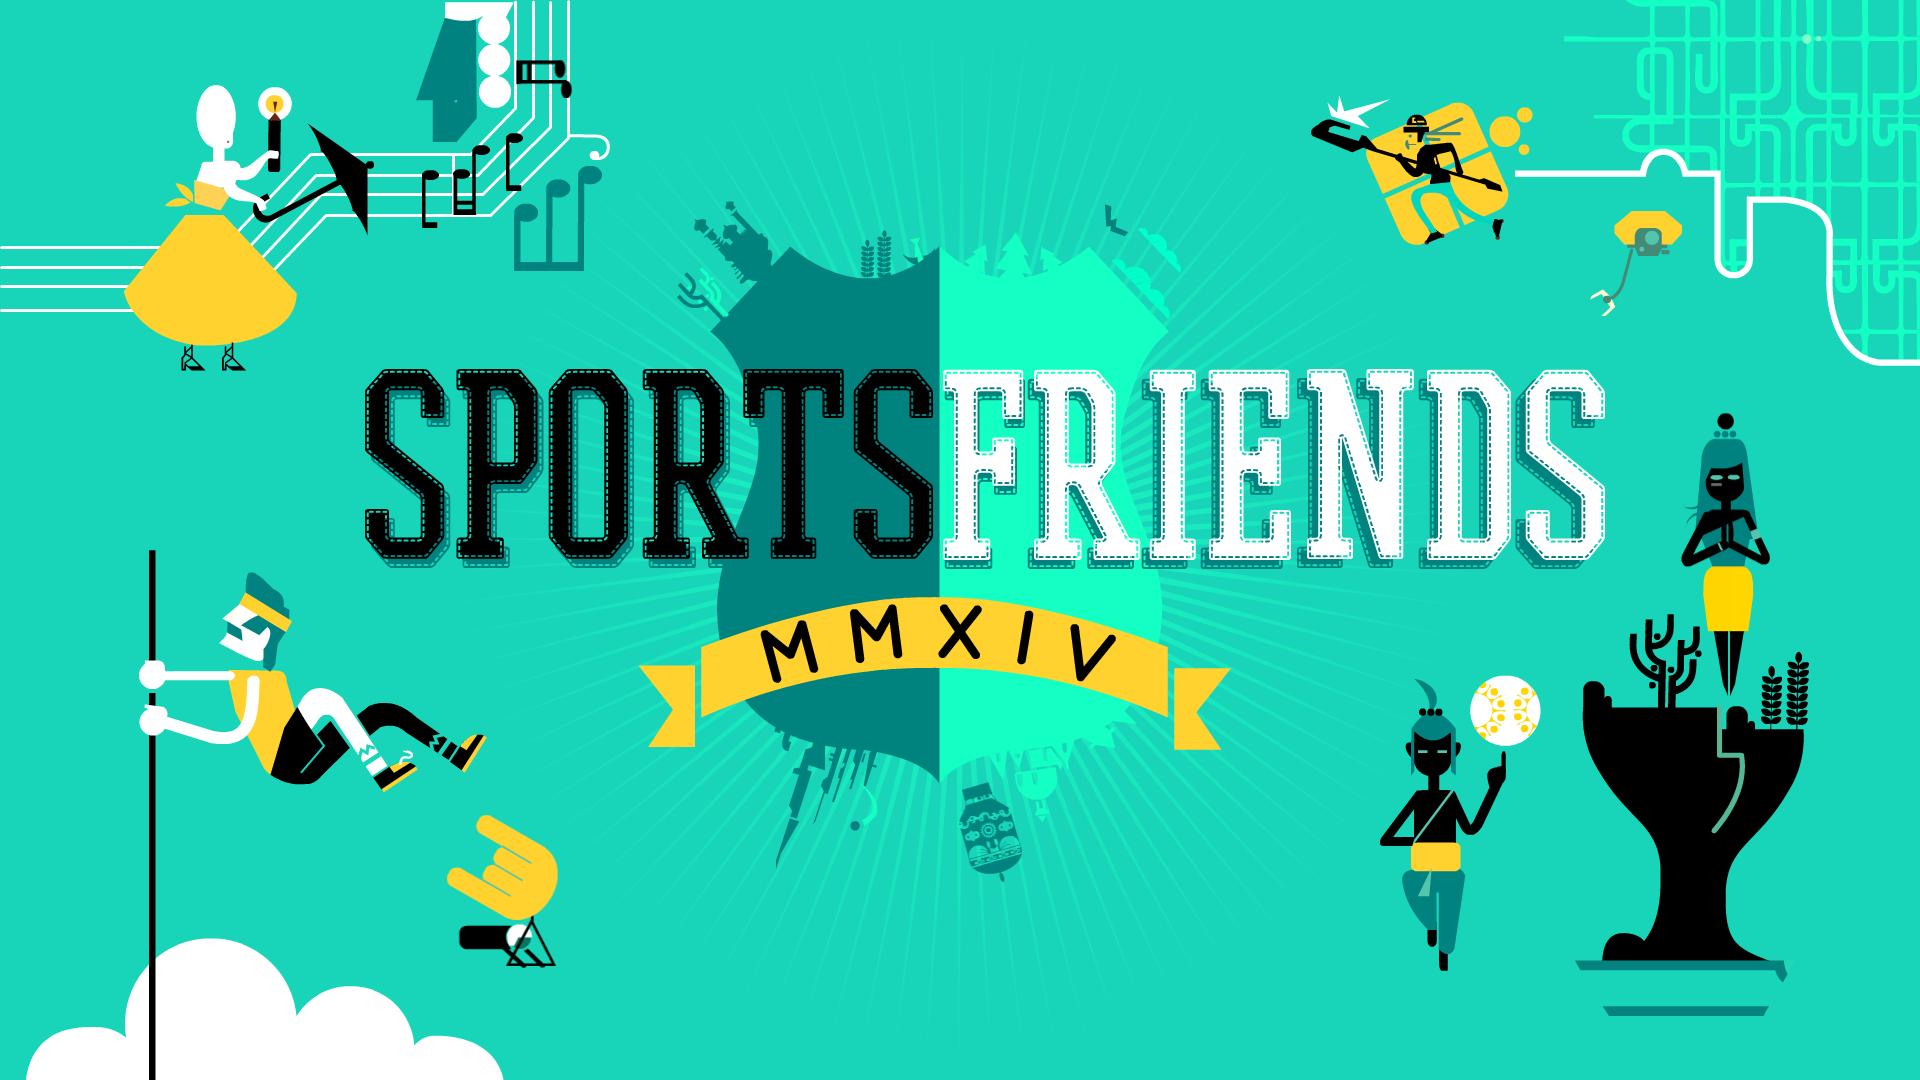 Cultura Geek Sportfriends